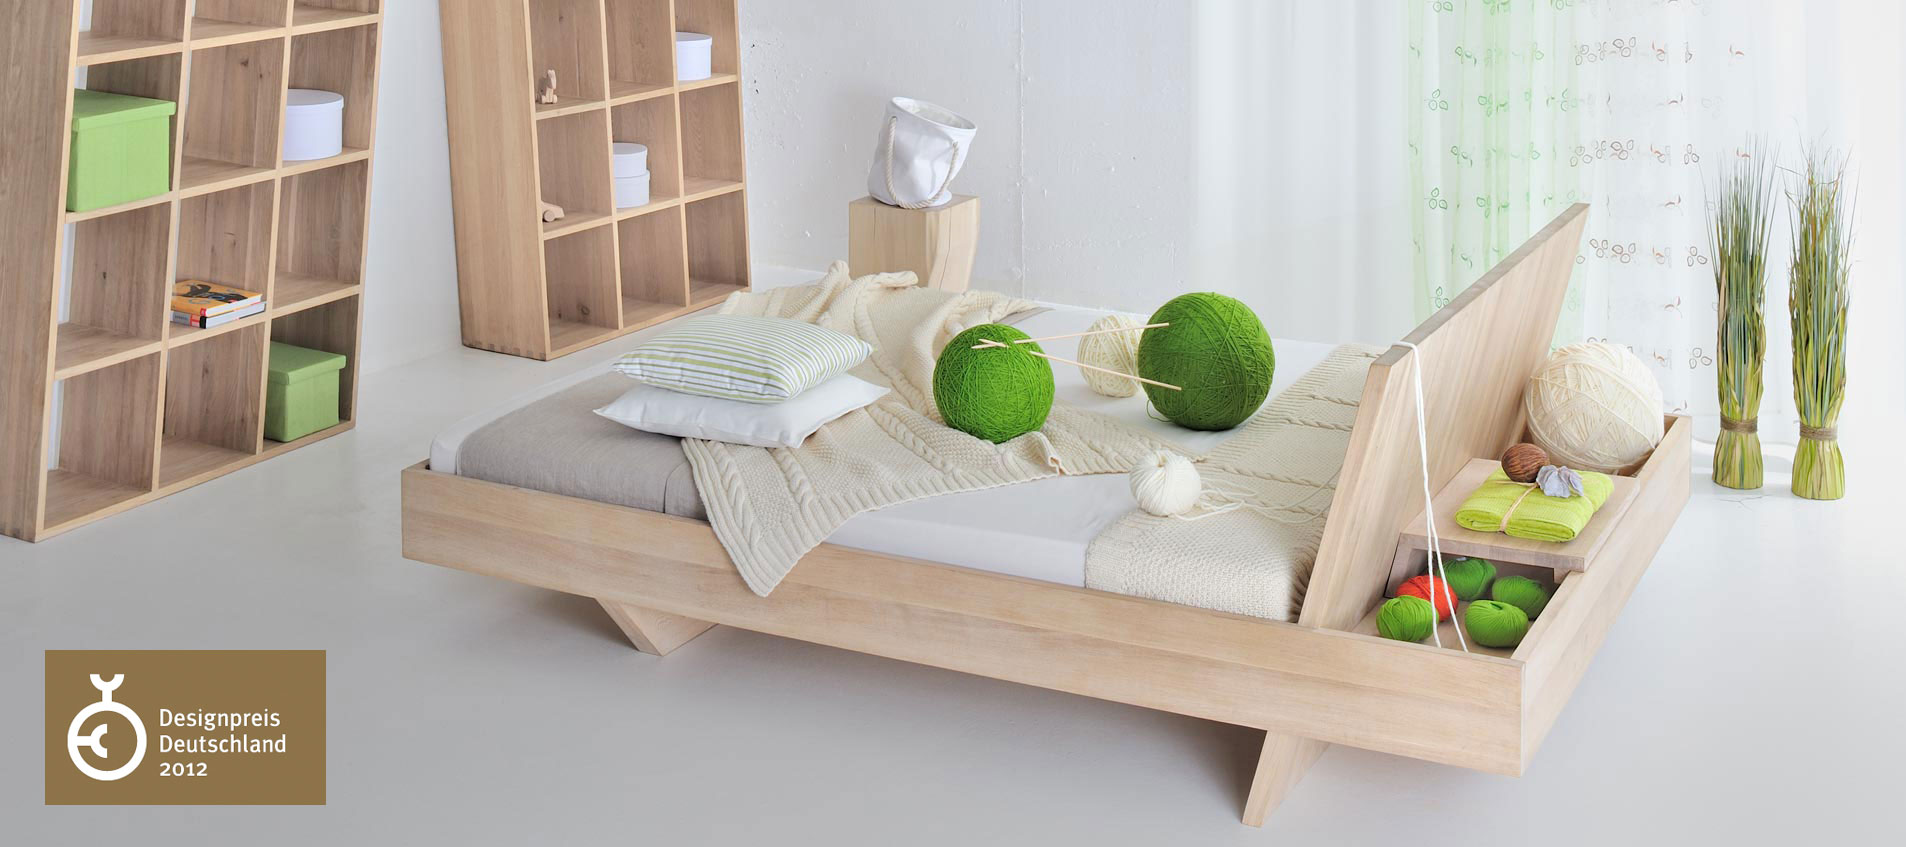 Somnia bed